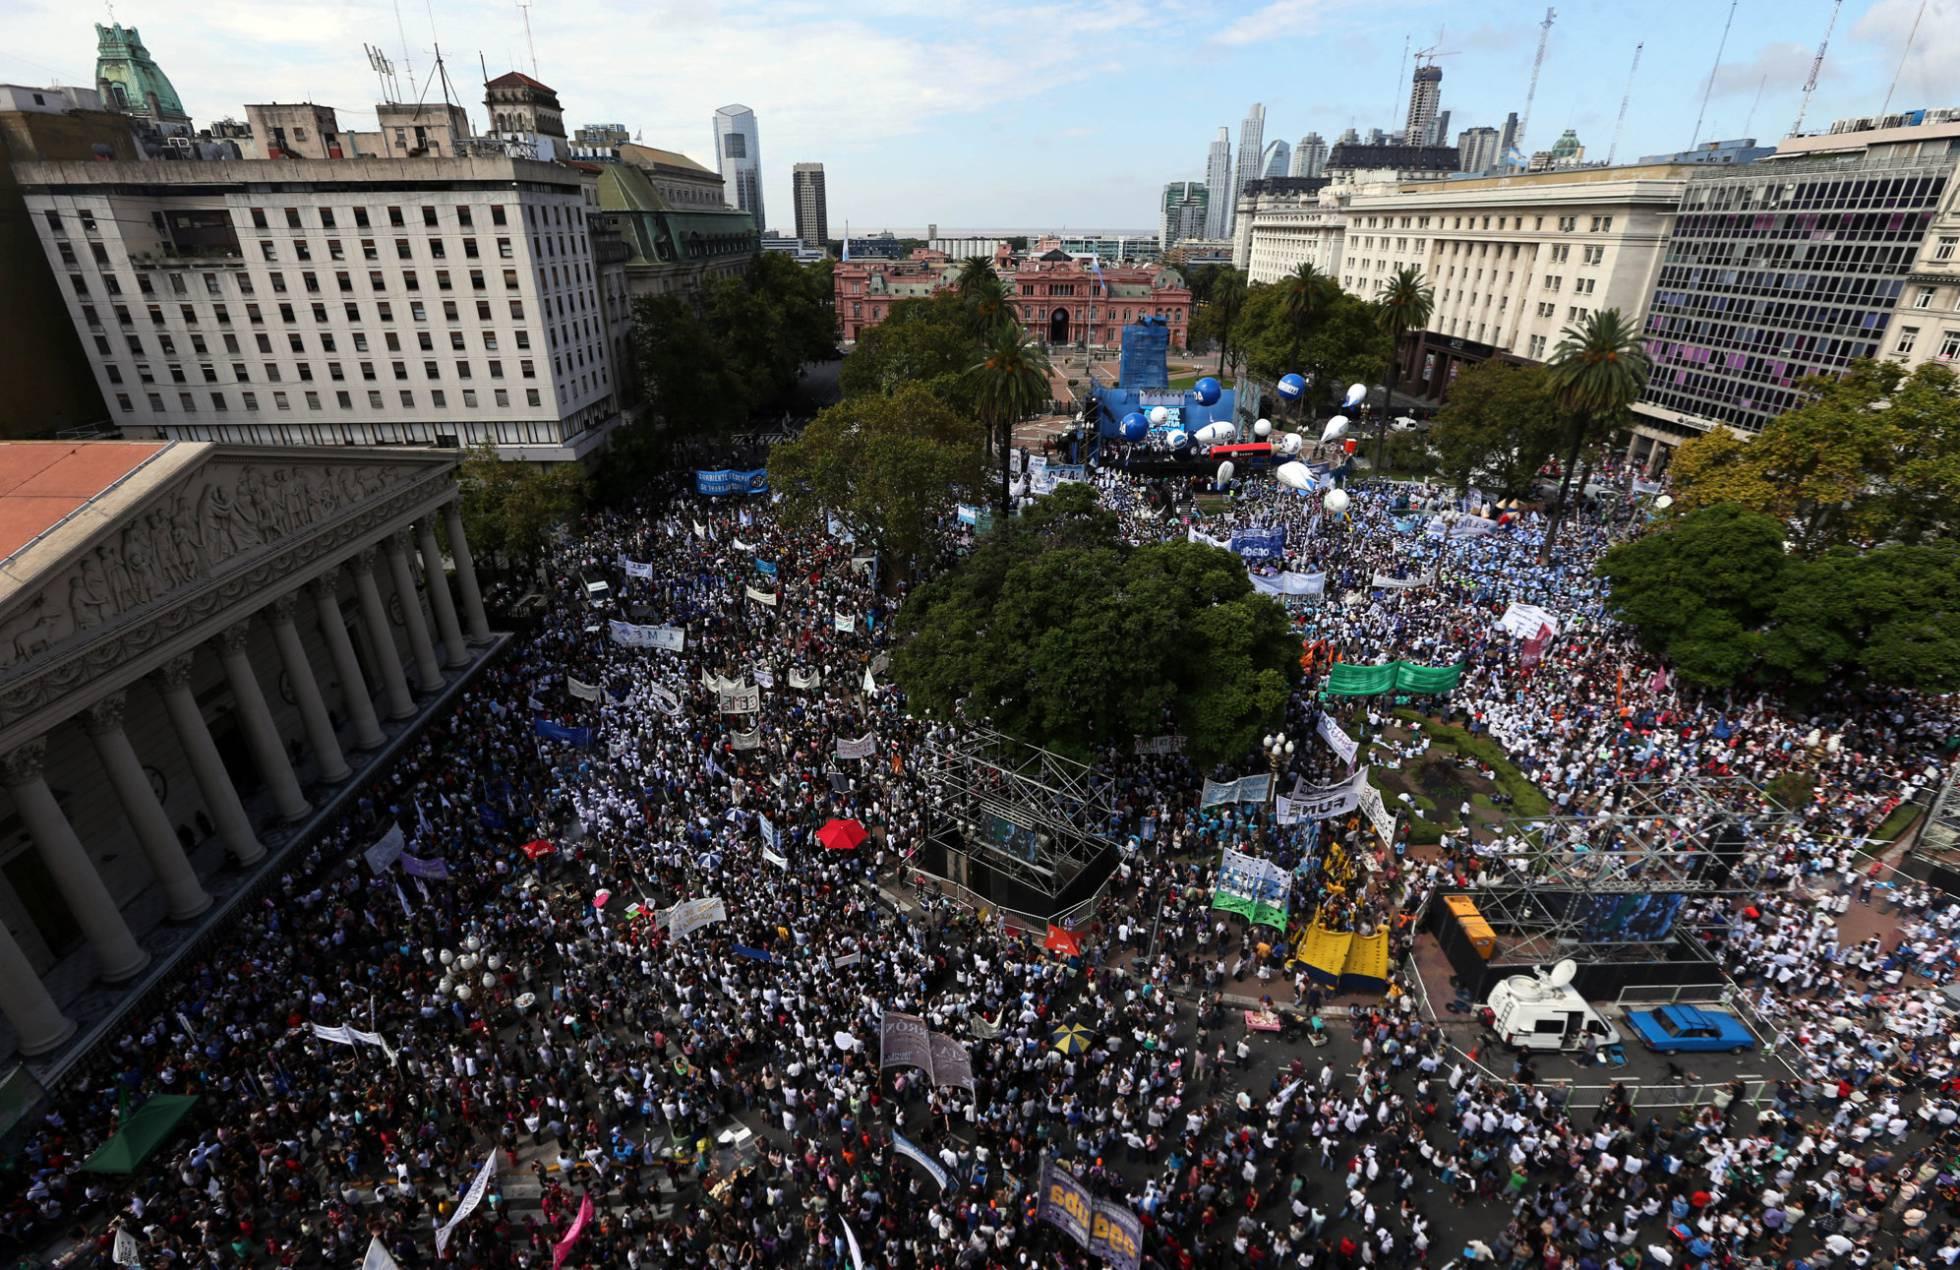 http://ep01.epimg.net/internacional/imagenes/2017/03/22/argentina/1490212465_255060_1490212632_noticia_normal_recorte1.jpg